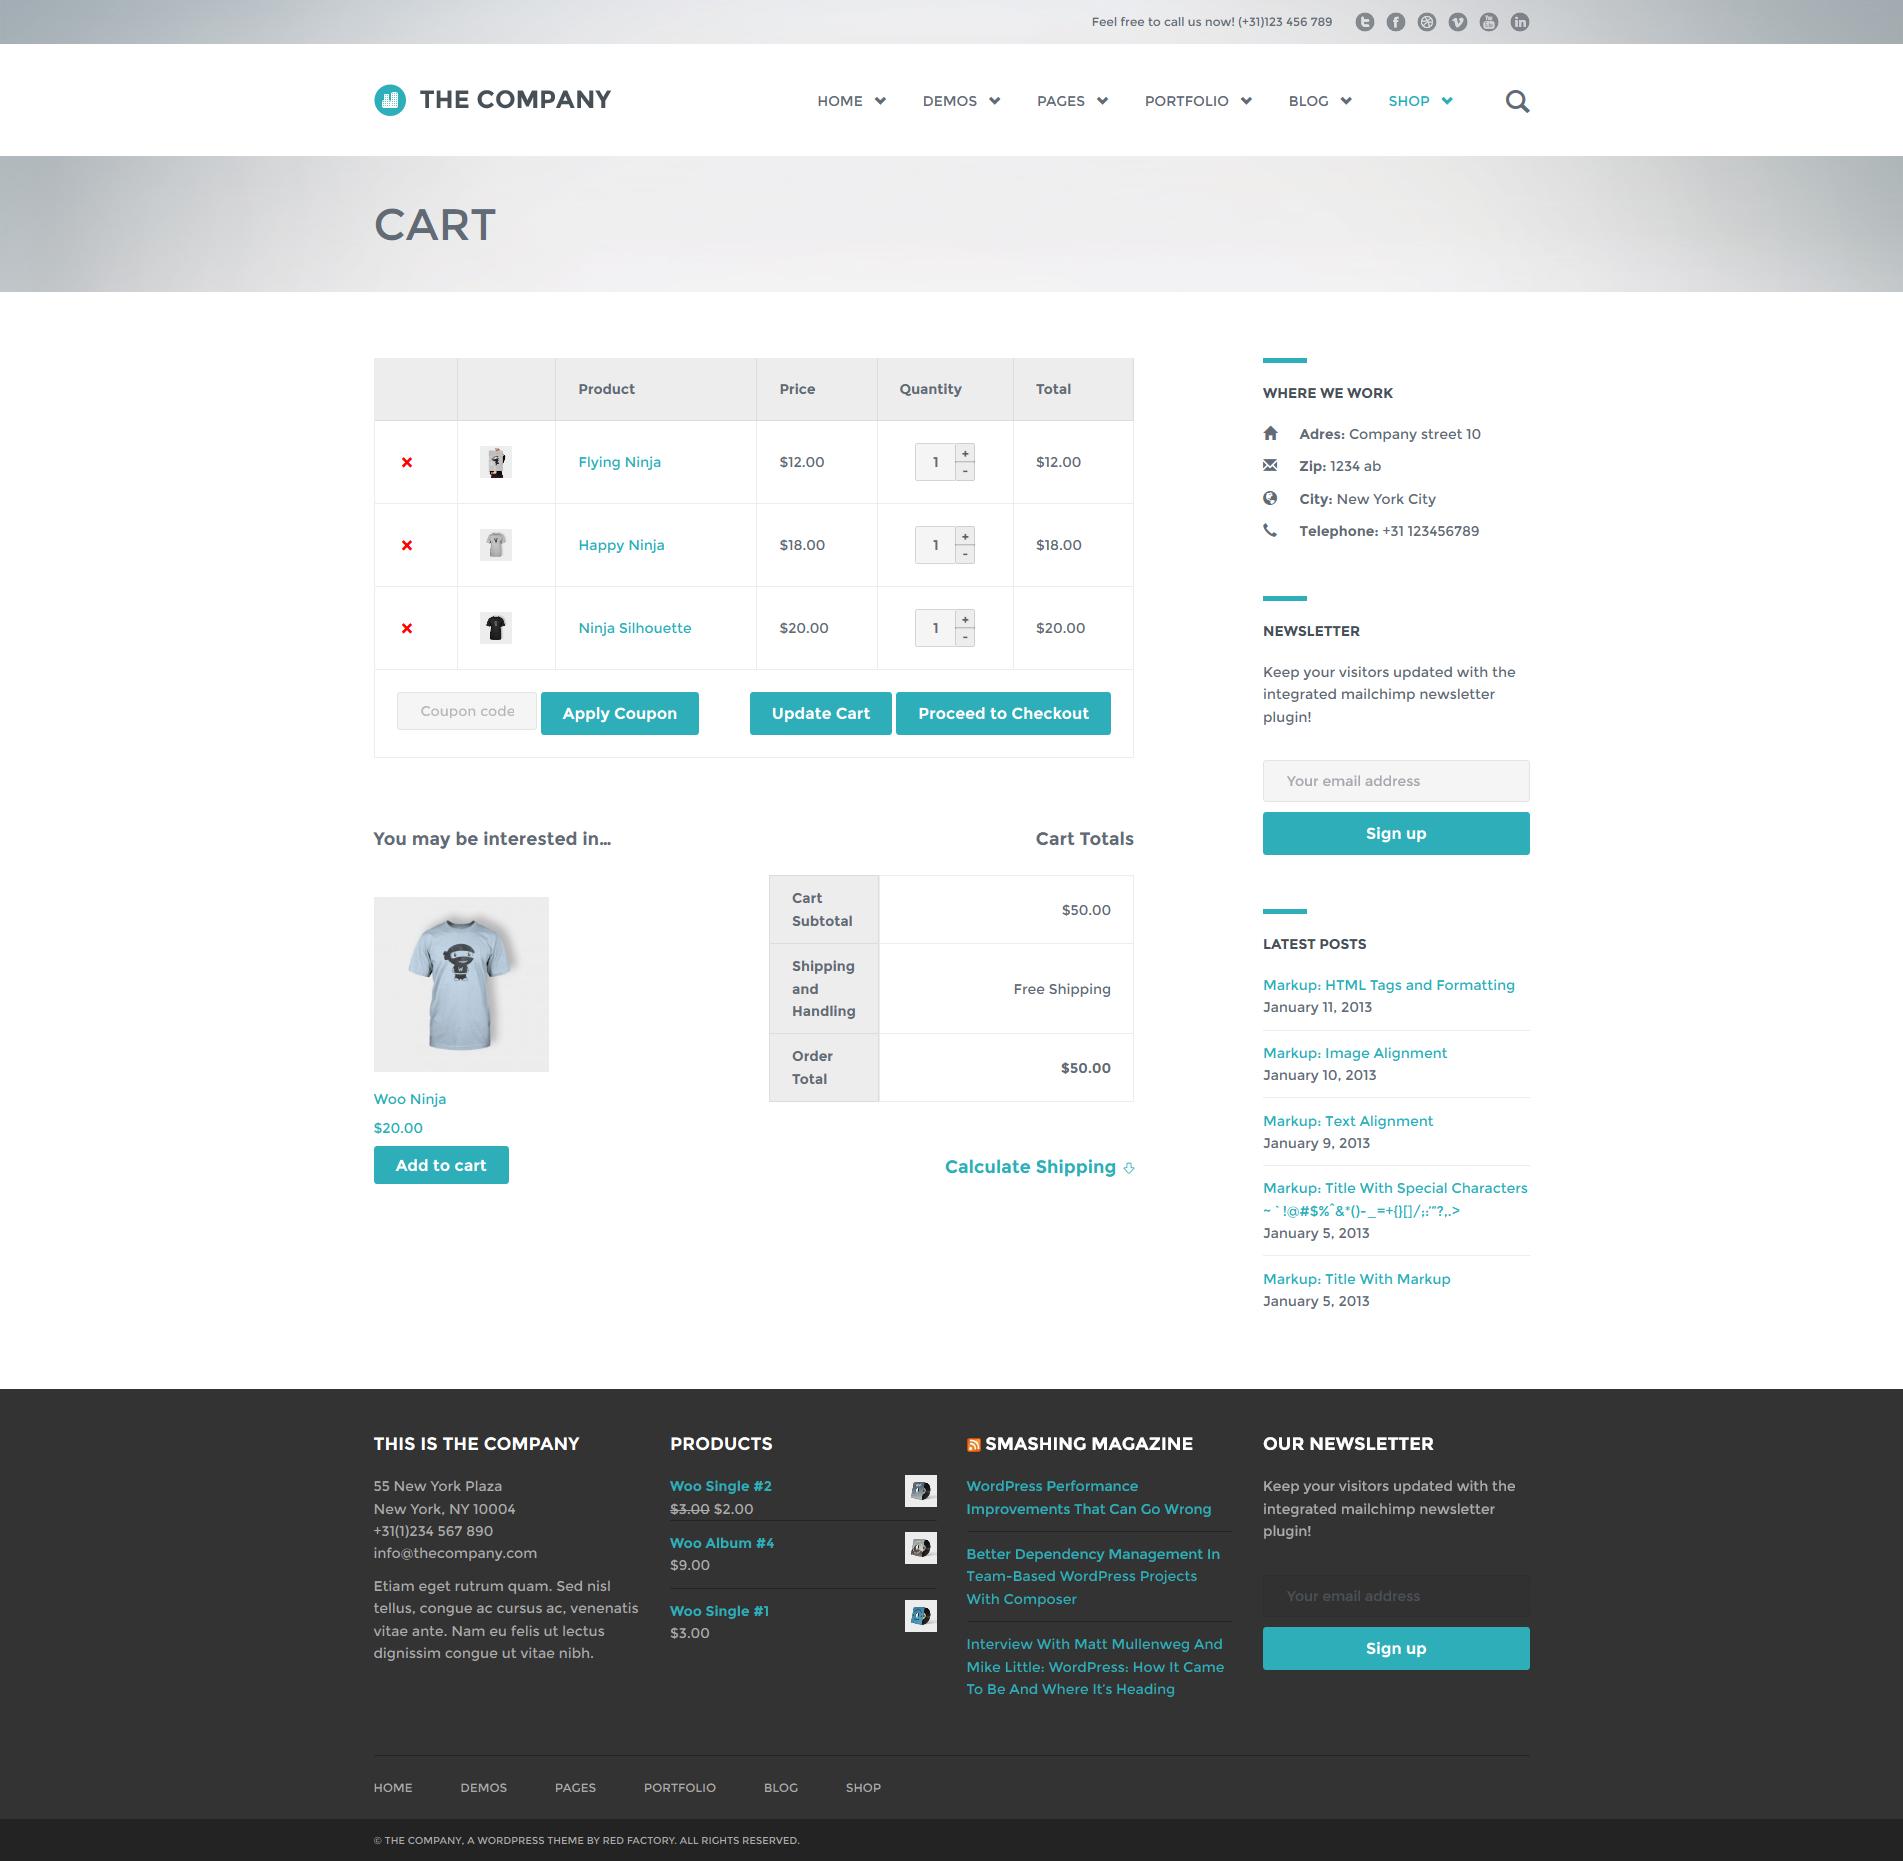 ����� ���� Download The Company - Responsive Multi-Purpose Theme (Wordpress) (Themefo